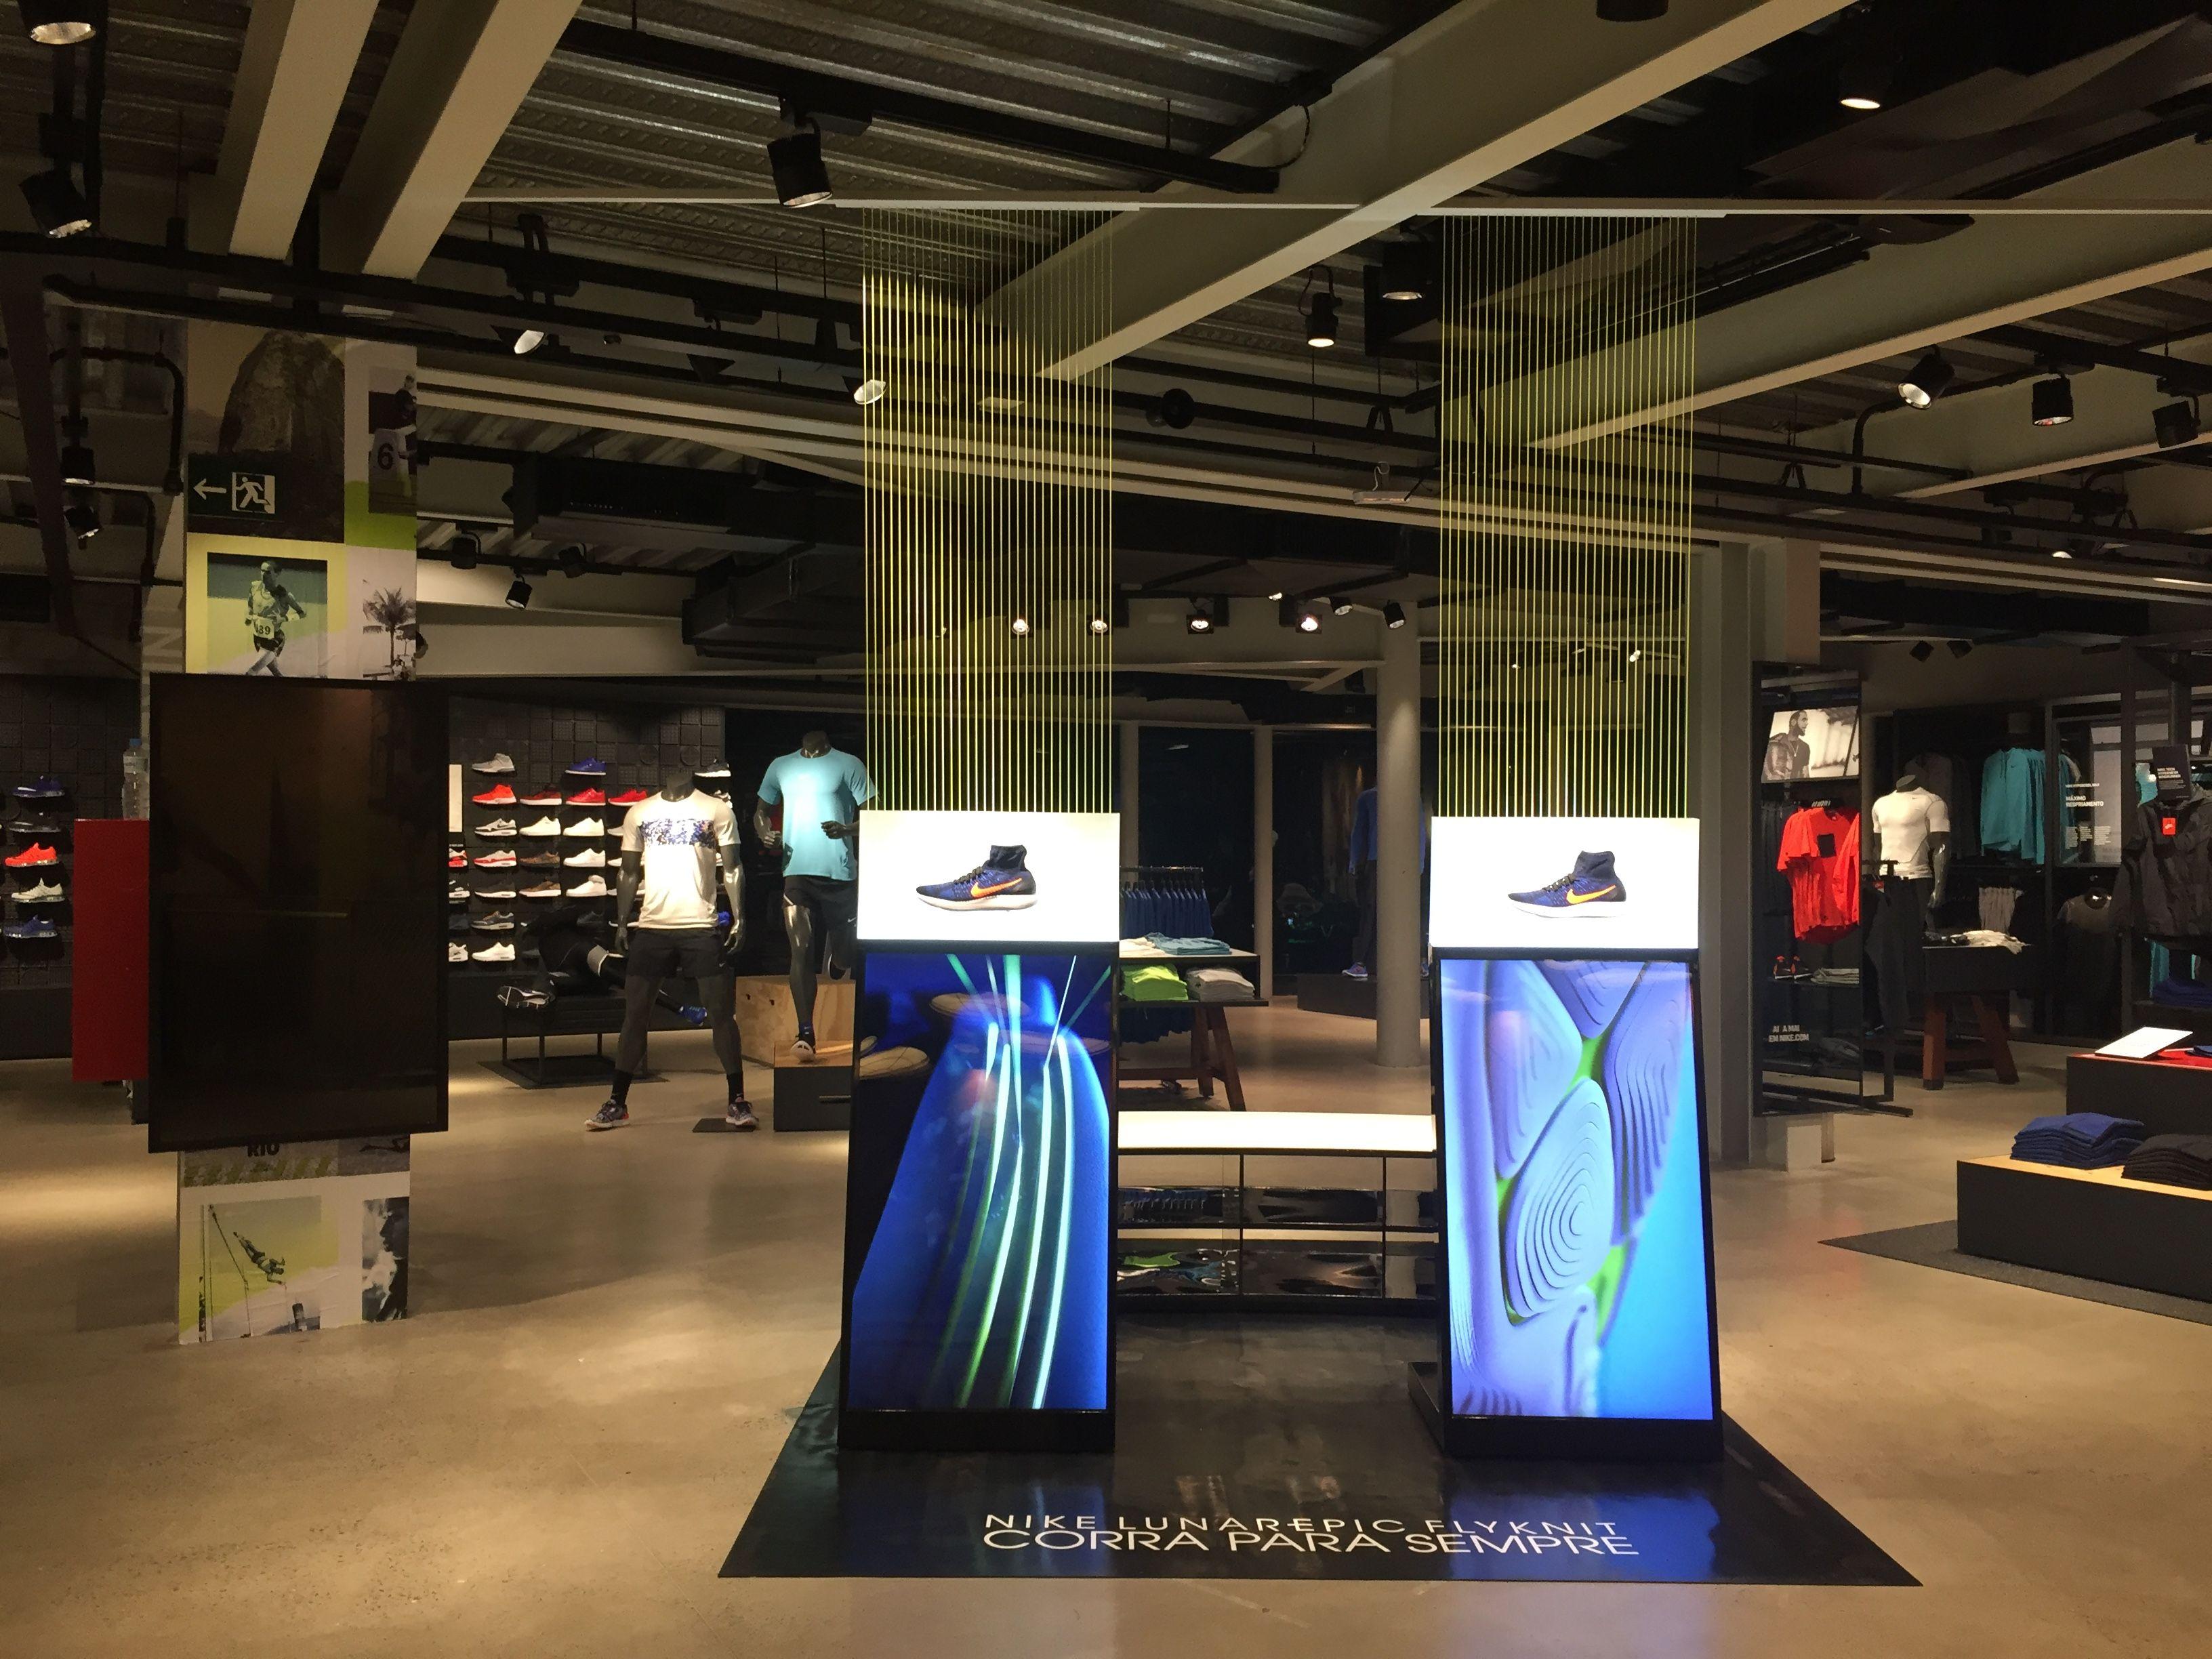 superávit Contrapartida bufanda  NIKE LUNAREPIC FLYKNIT at NIKE IPANEMA. | Retail interior, Shop interiors,  Retail design